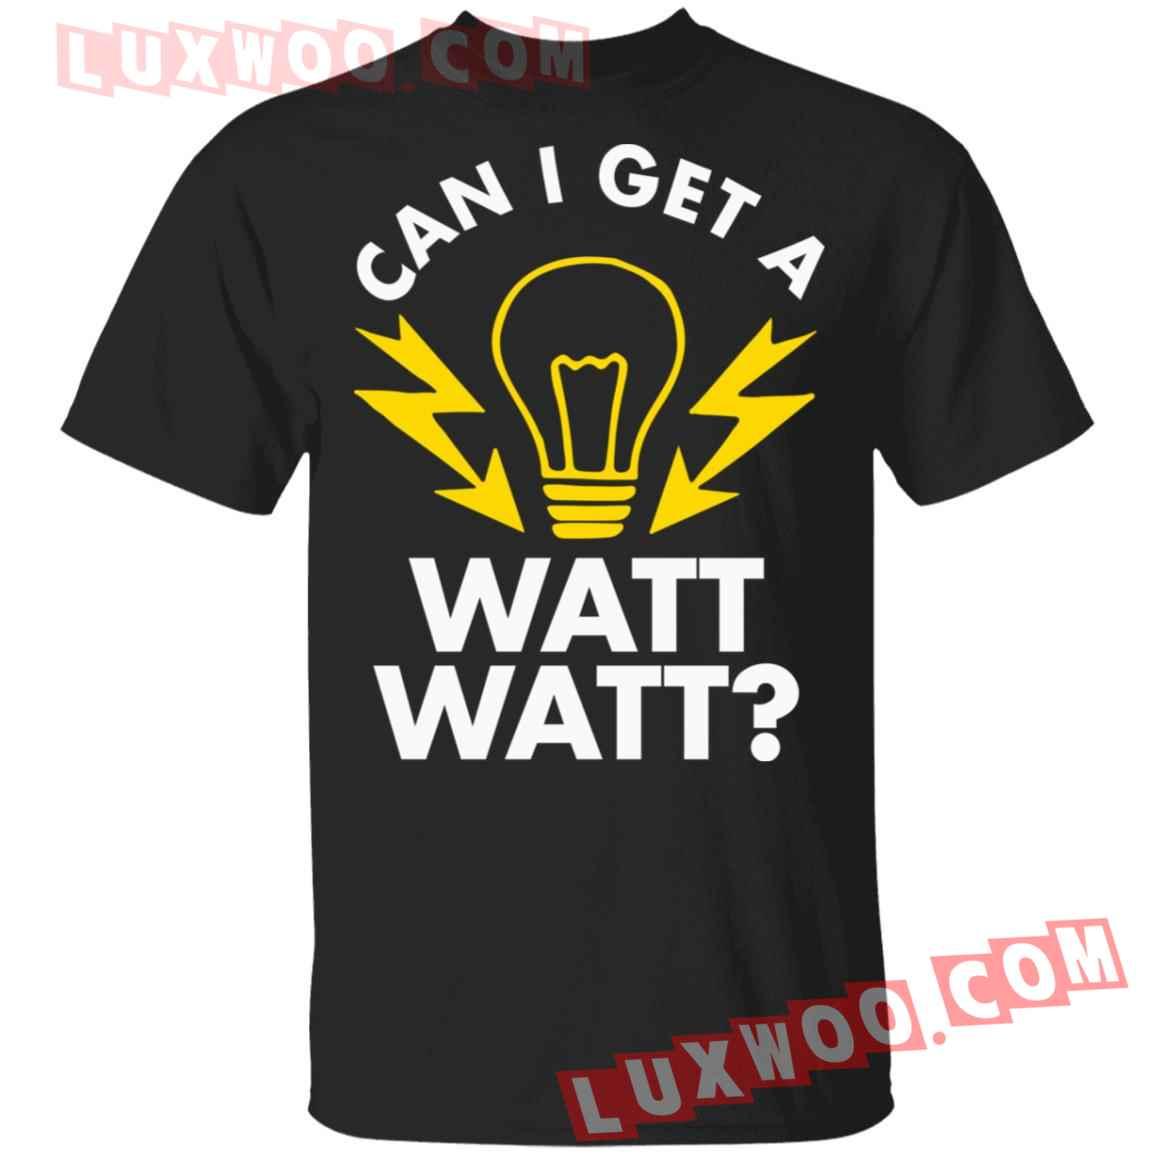 Can I Get A Watt Watt Shirt